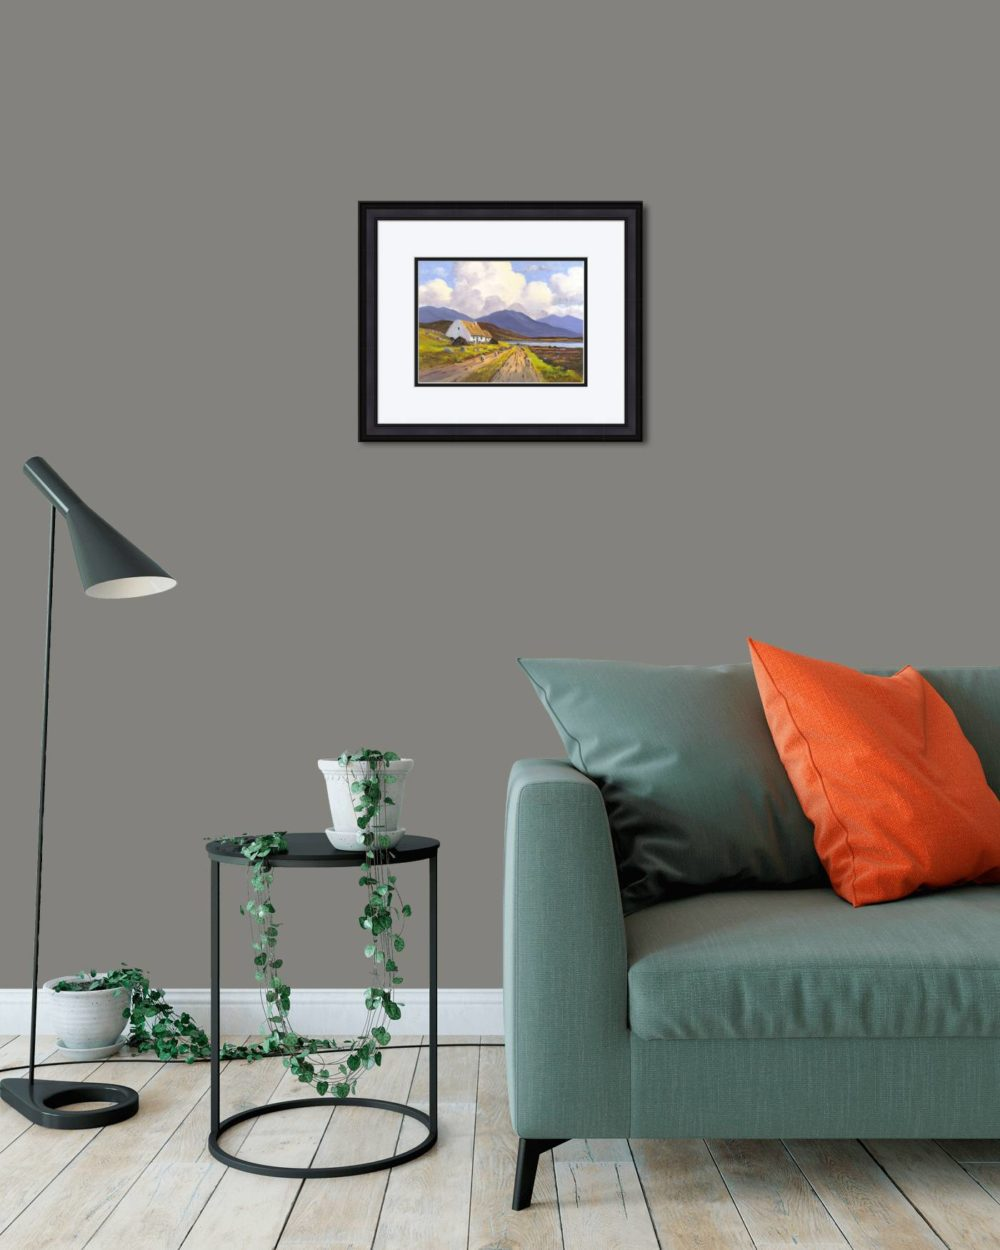 Connemara Cottage Print (Small) in Black Frame in Room